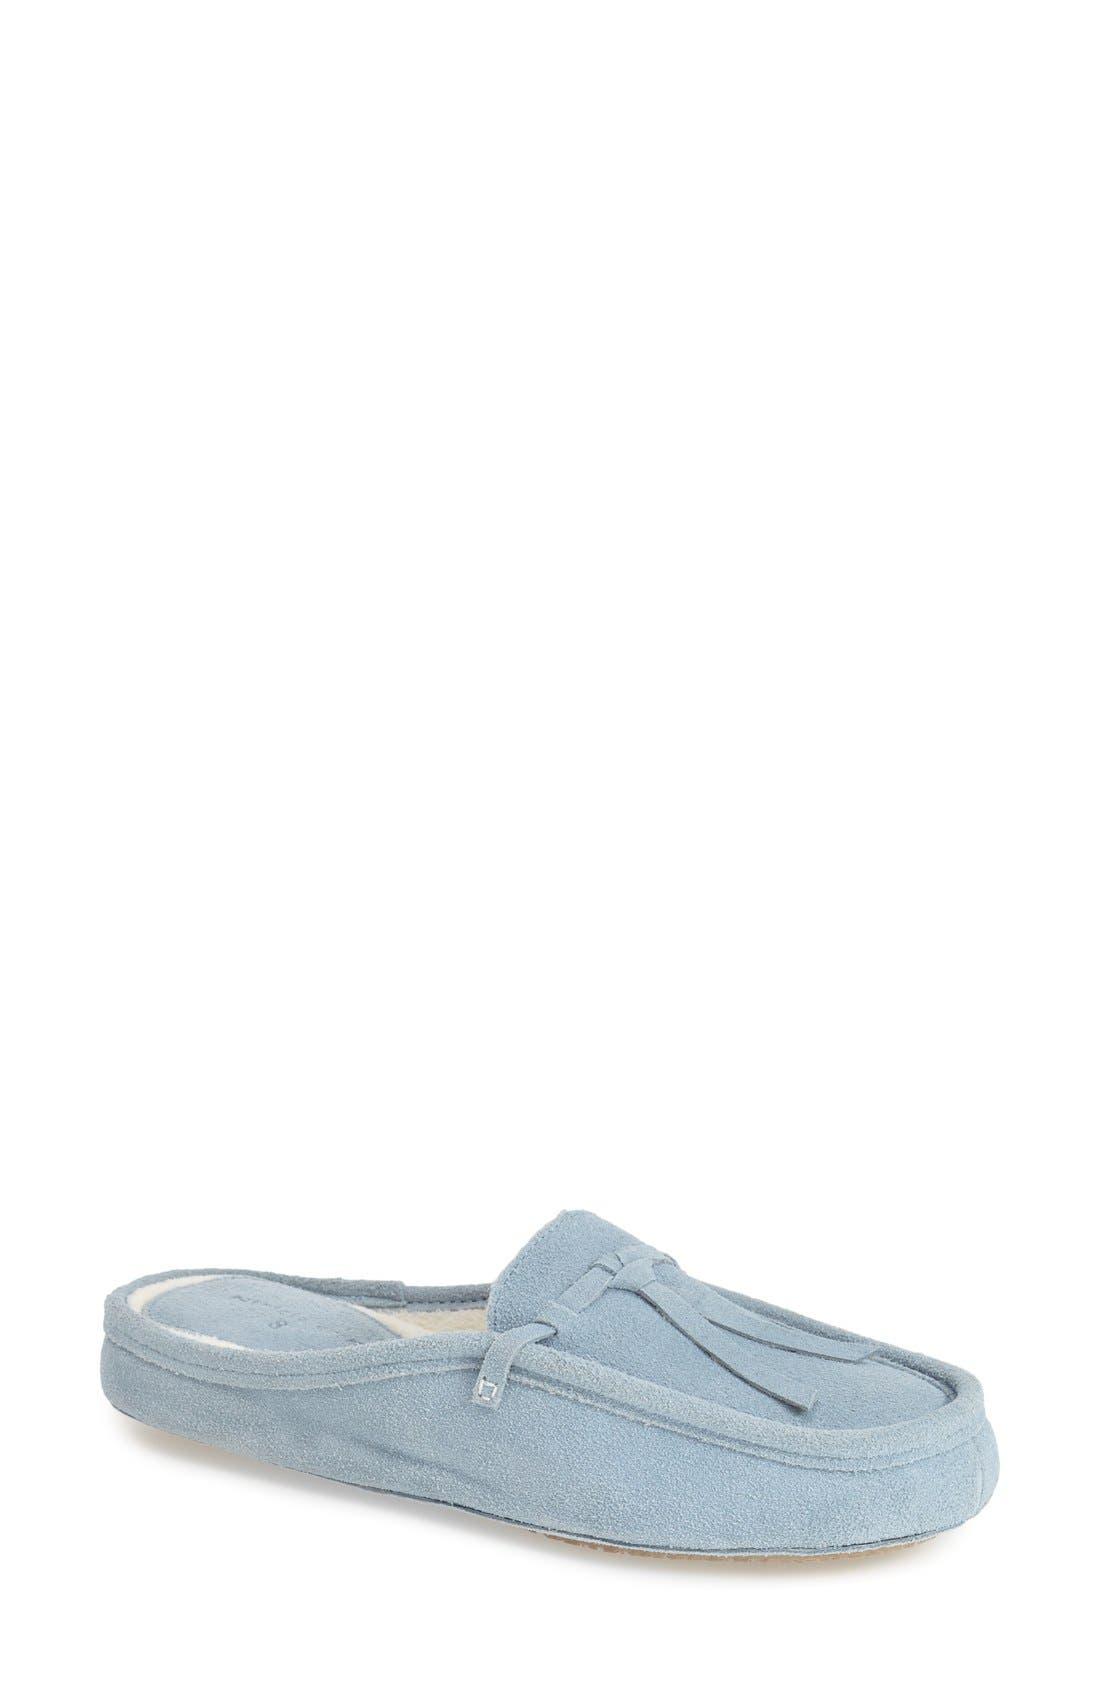 patriciagreen 'Greenwich' Mule Slipper,                         Main,                         color, Light Blue Suede